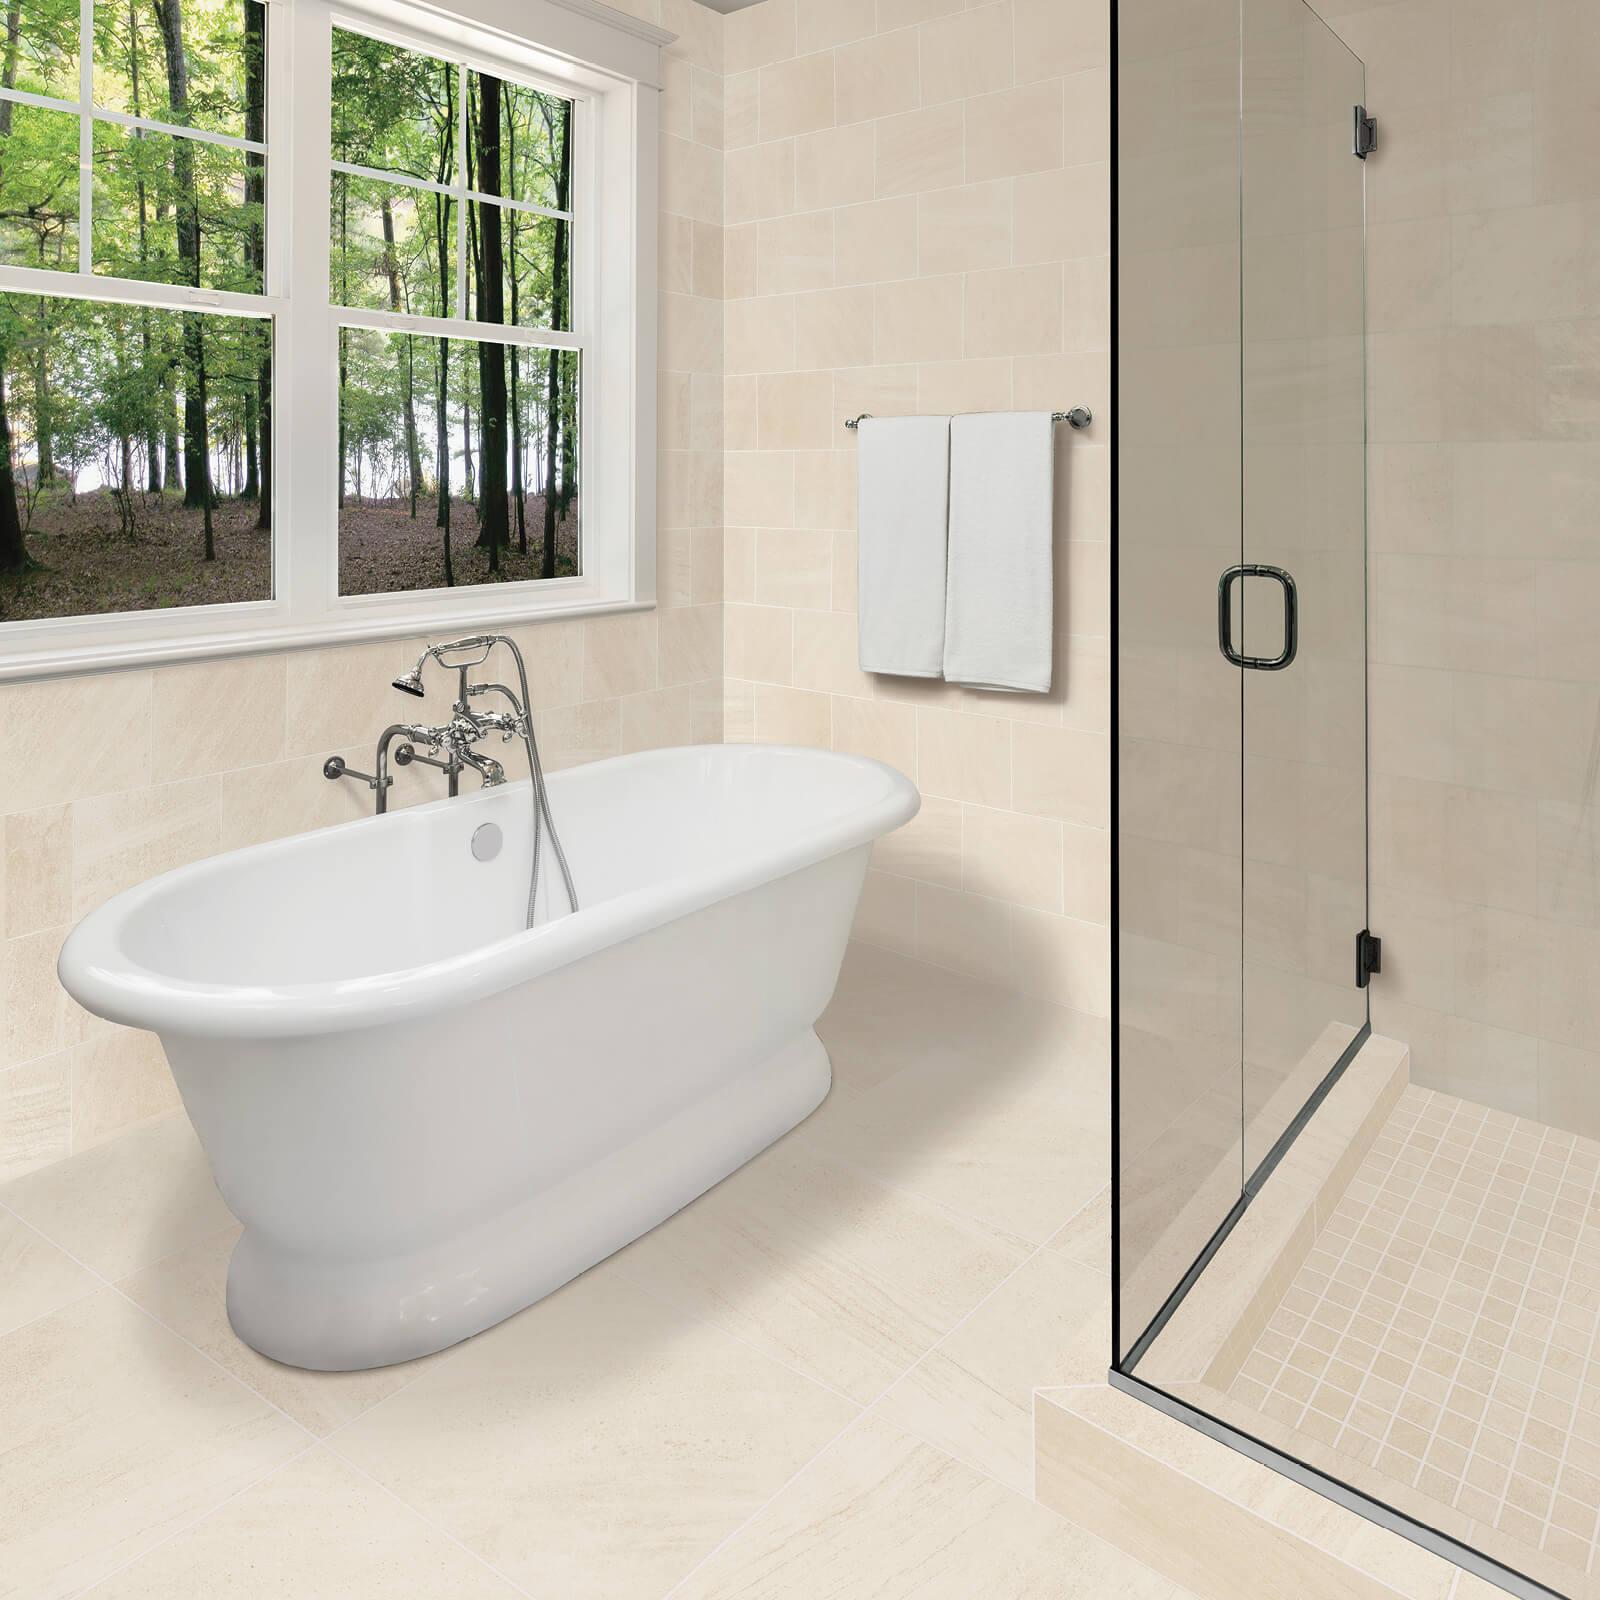 Bathroom Tiles | McSwain Carpet & Floors